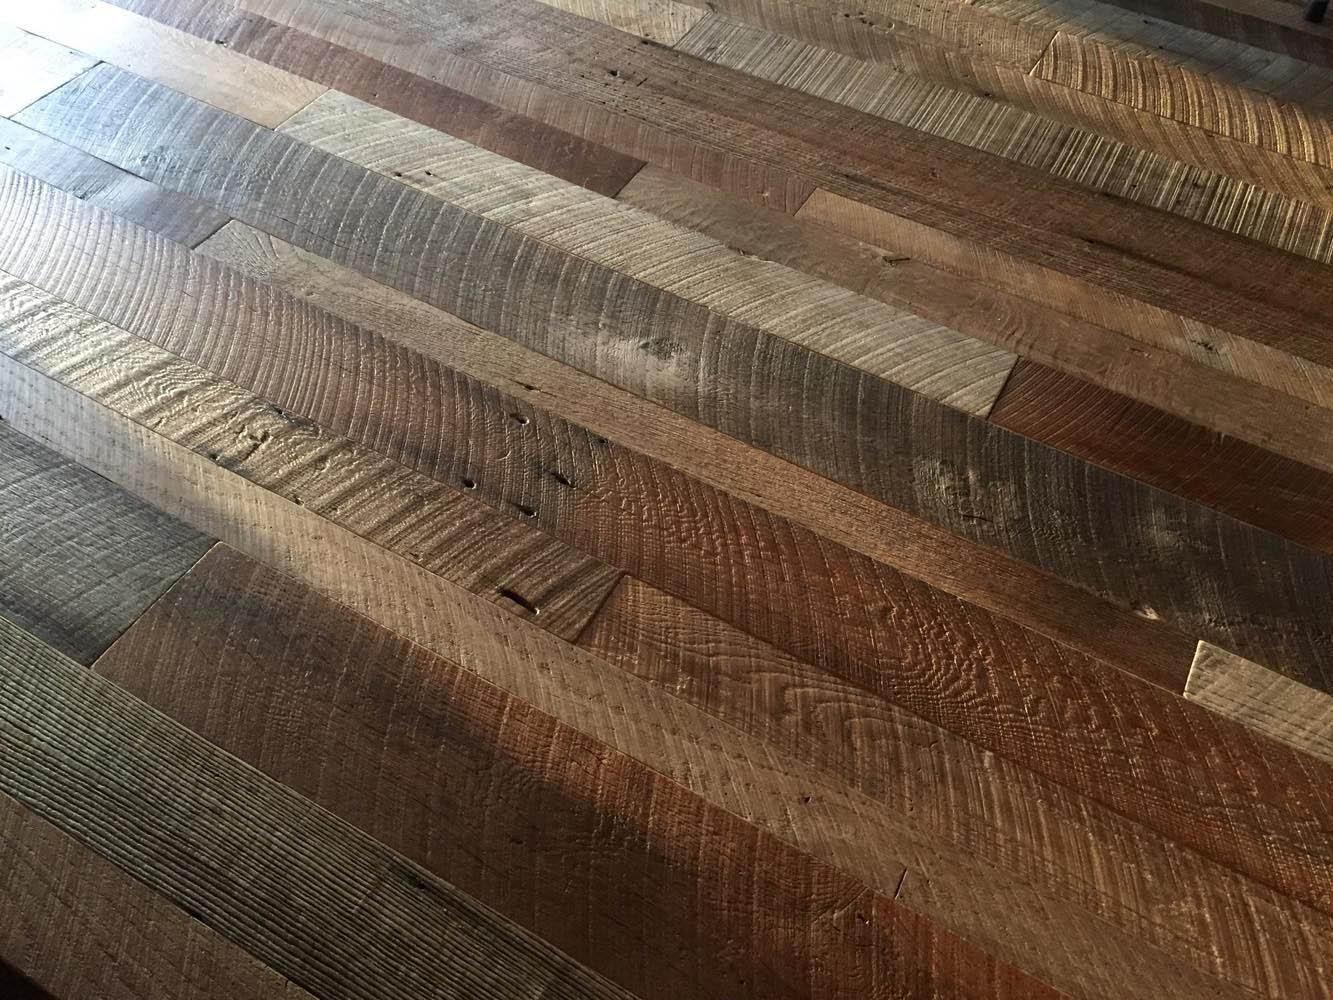 Beau FARNER HARDWOOD FLOORING. Reclaimed Rustic Barn Oak Flooring   Random Width